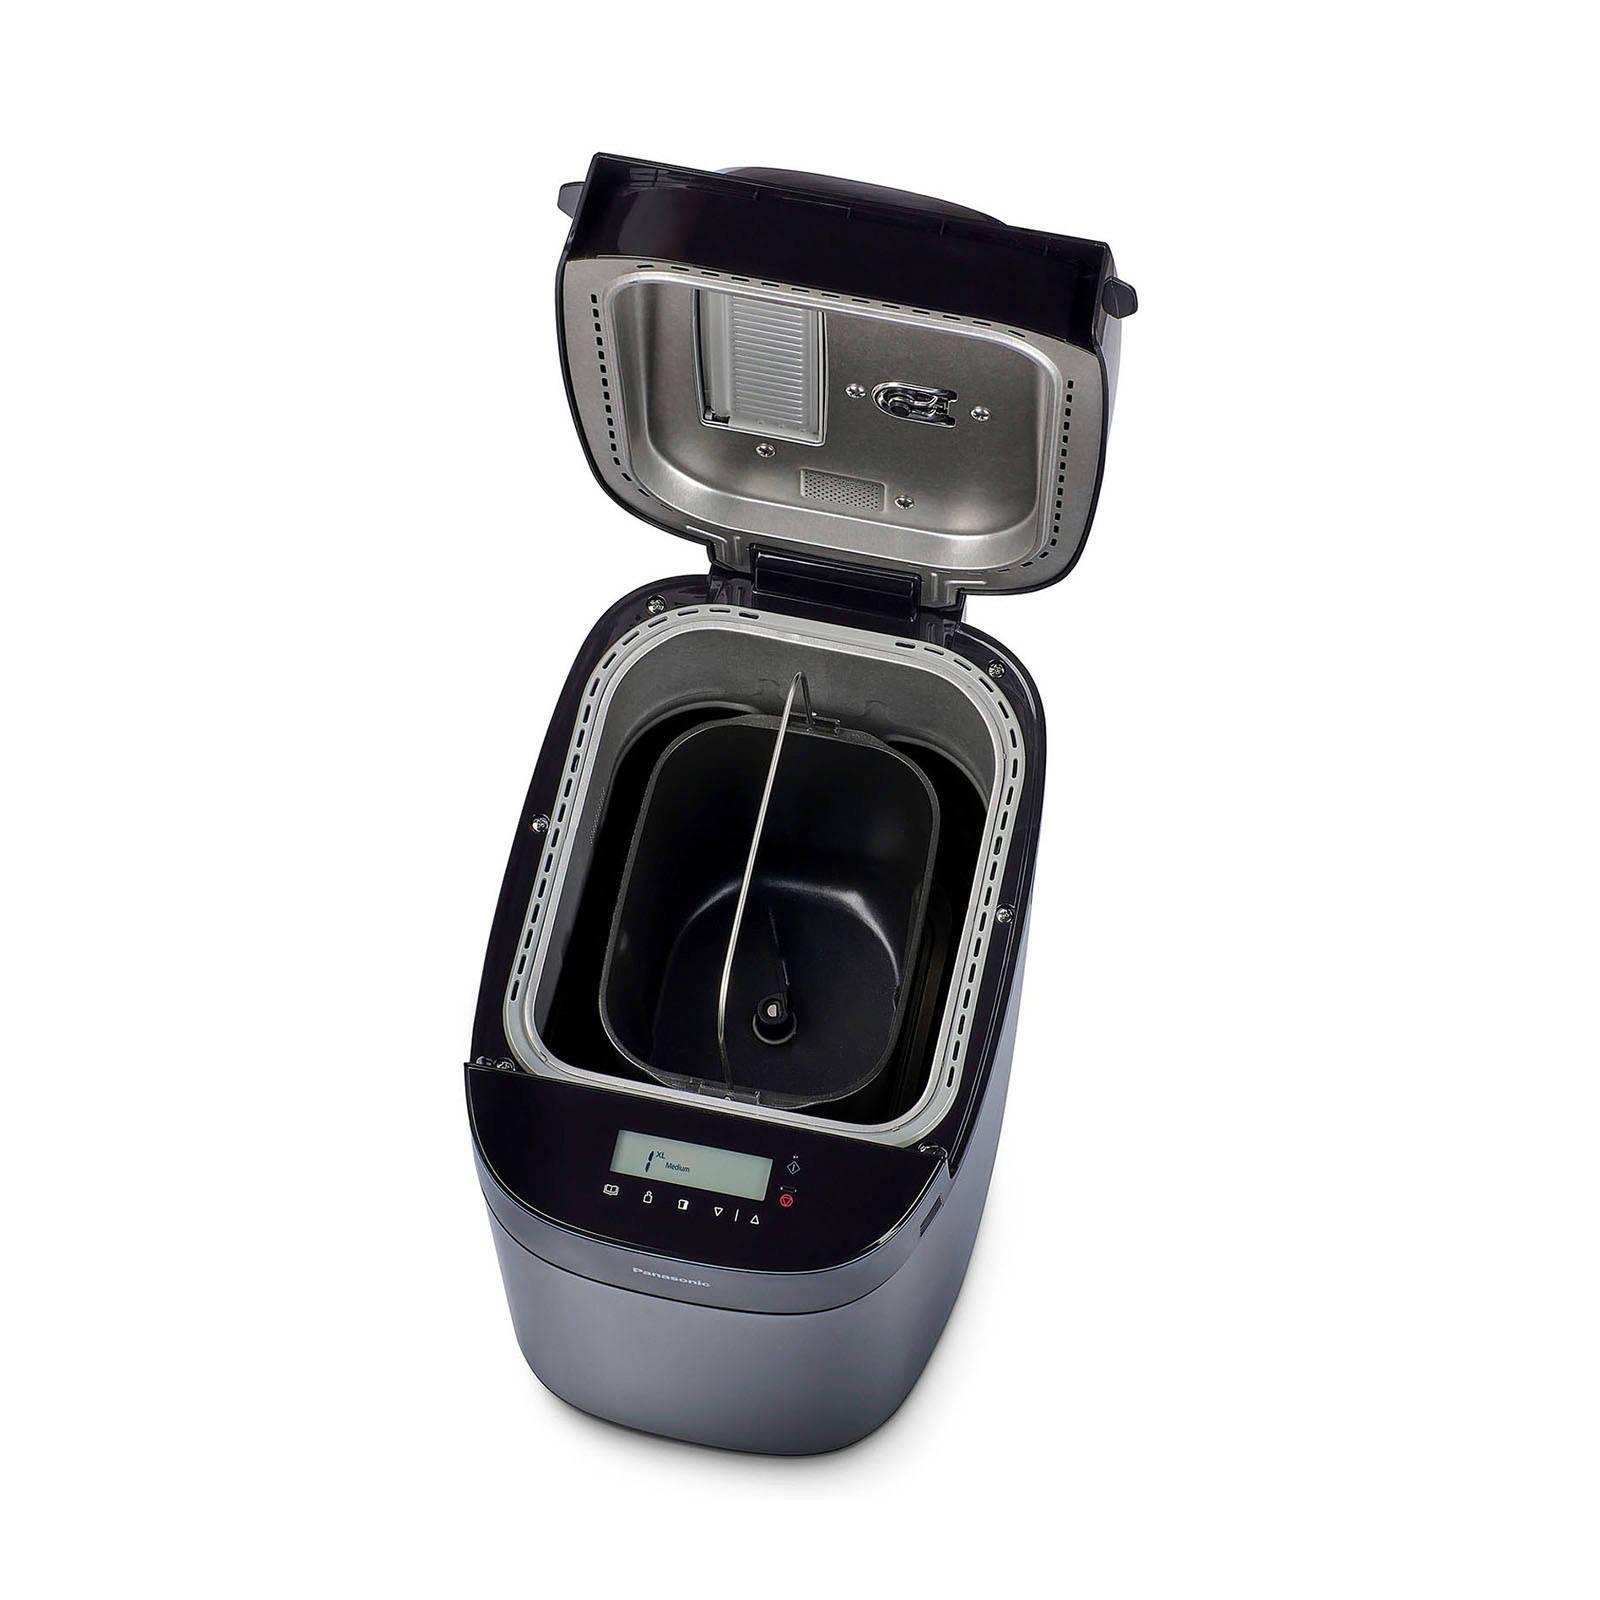 Panasonic SD-ZX2522KXG broodbakmachine online kopen